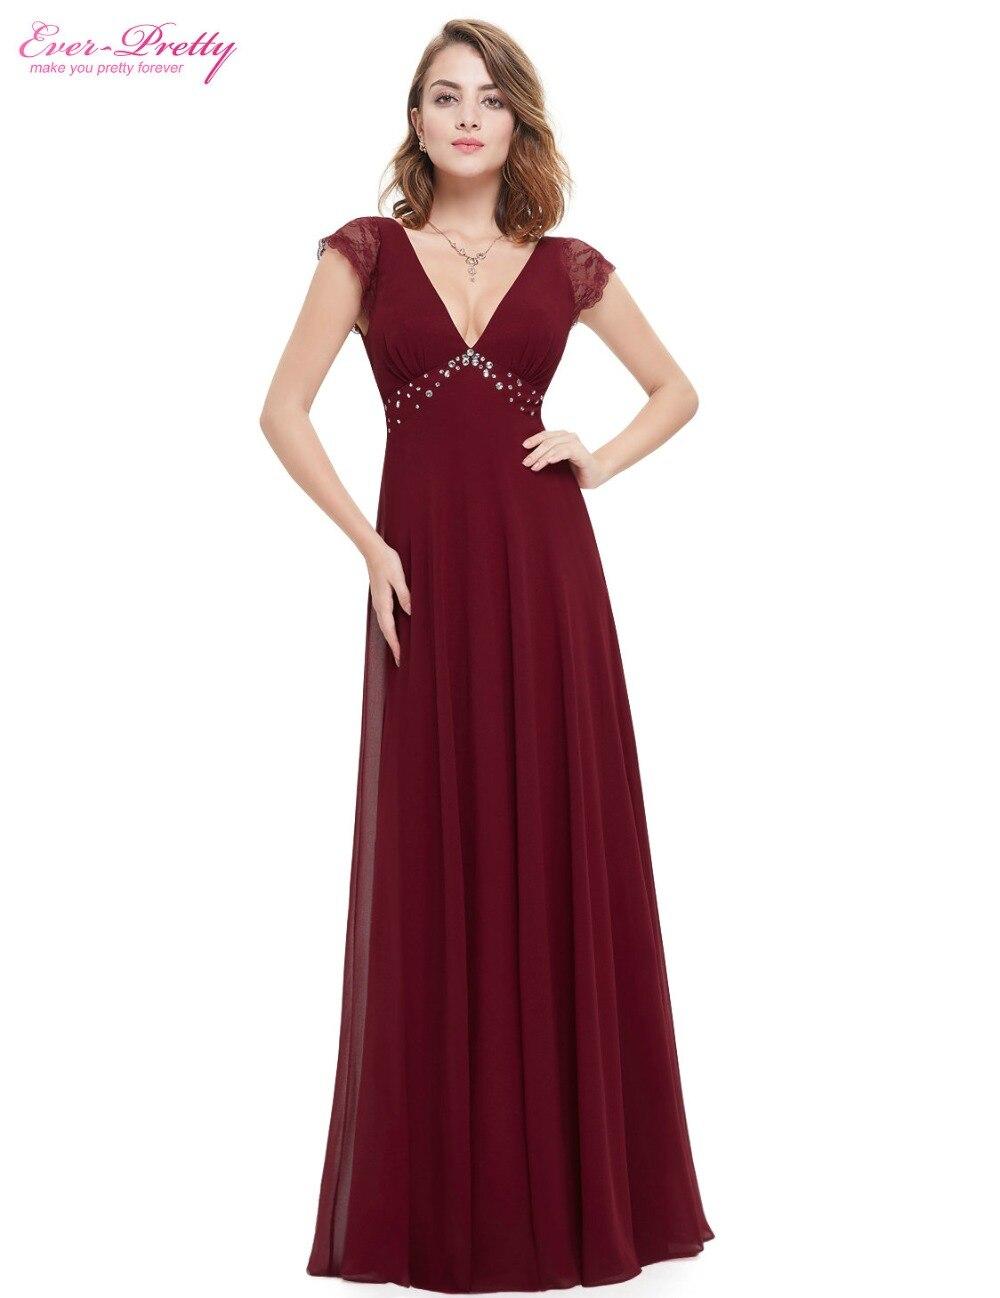 Formal Dresses Clearance Promotion-Shop for Promotional Formal ...